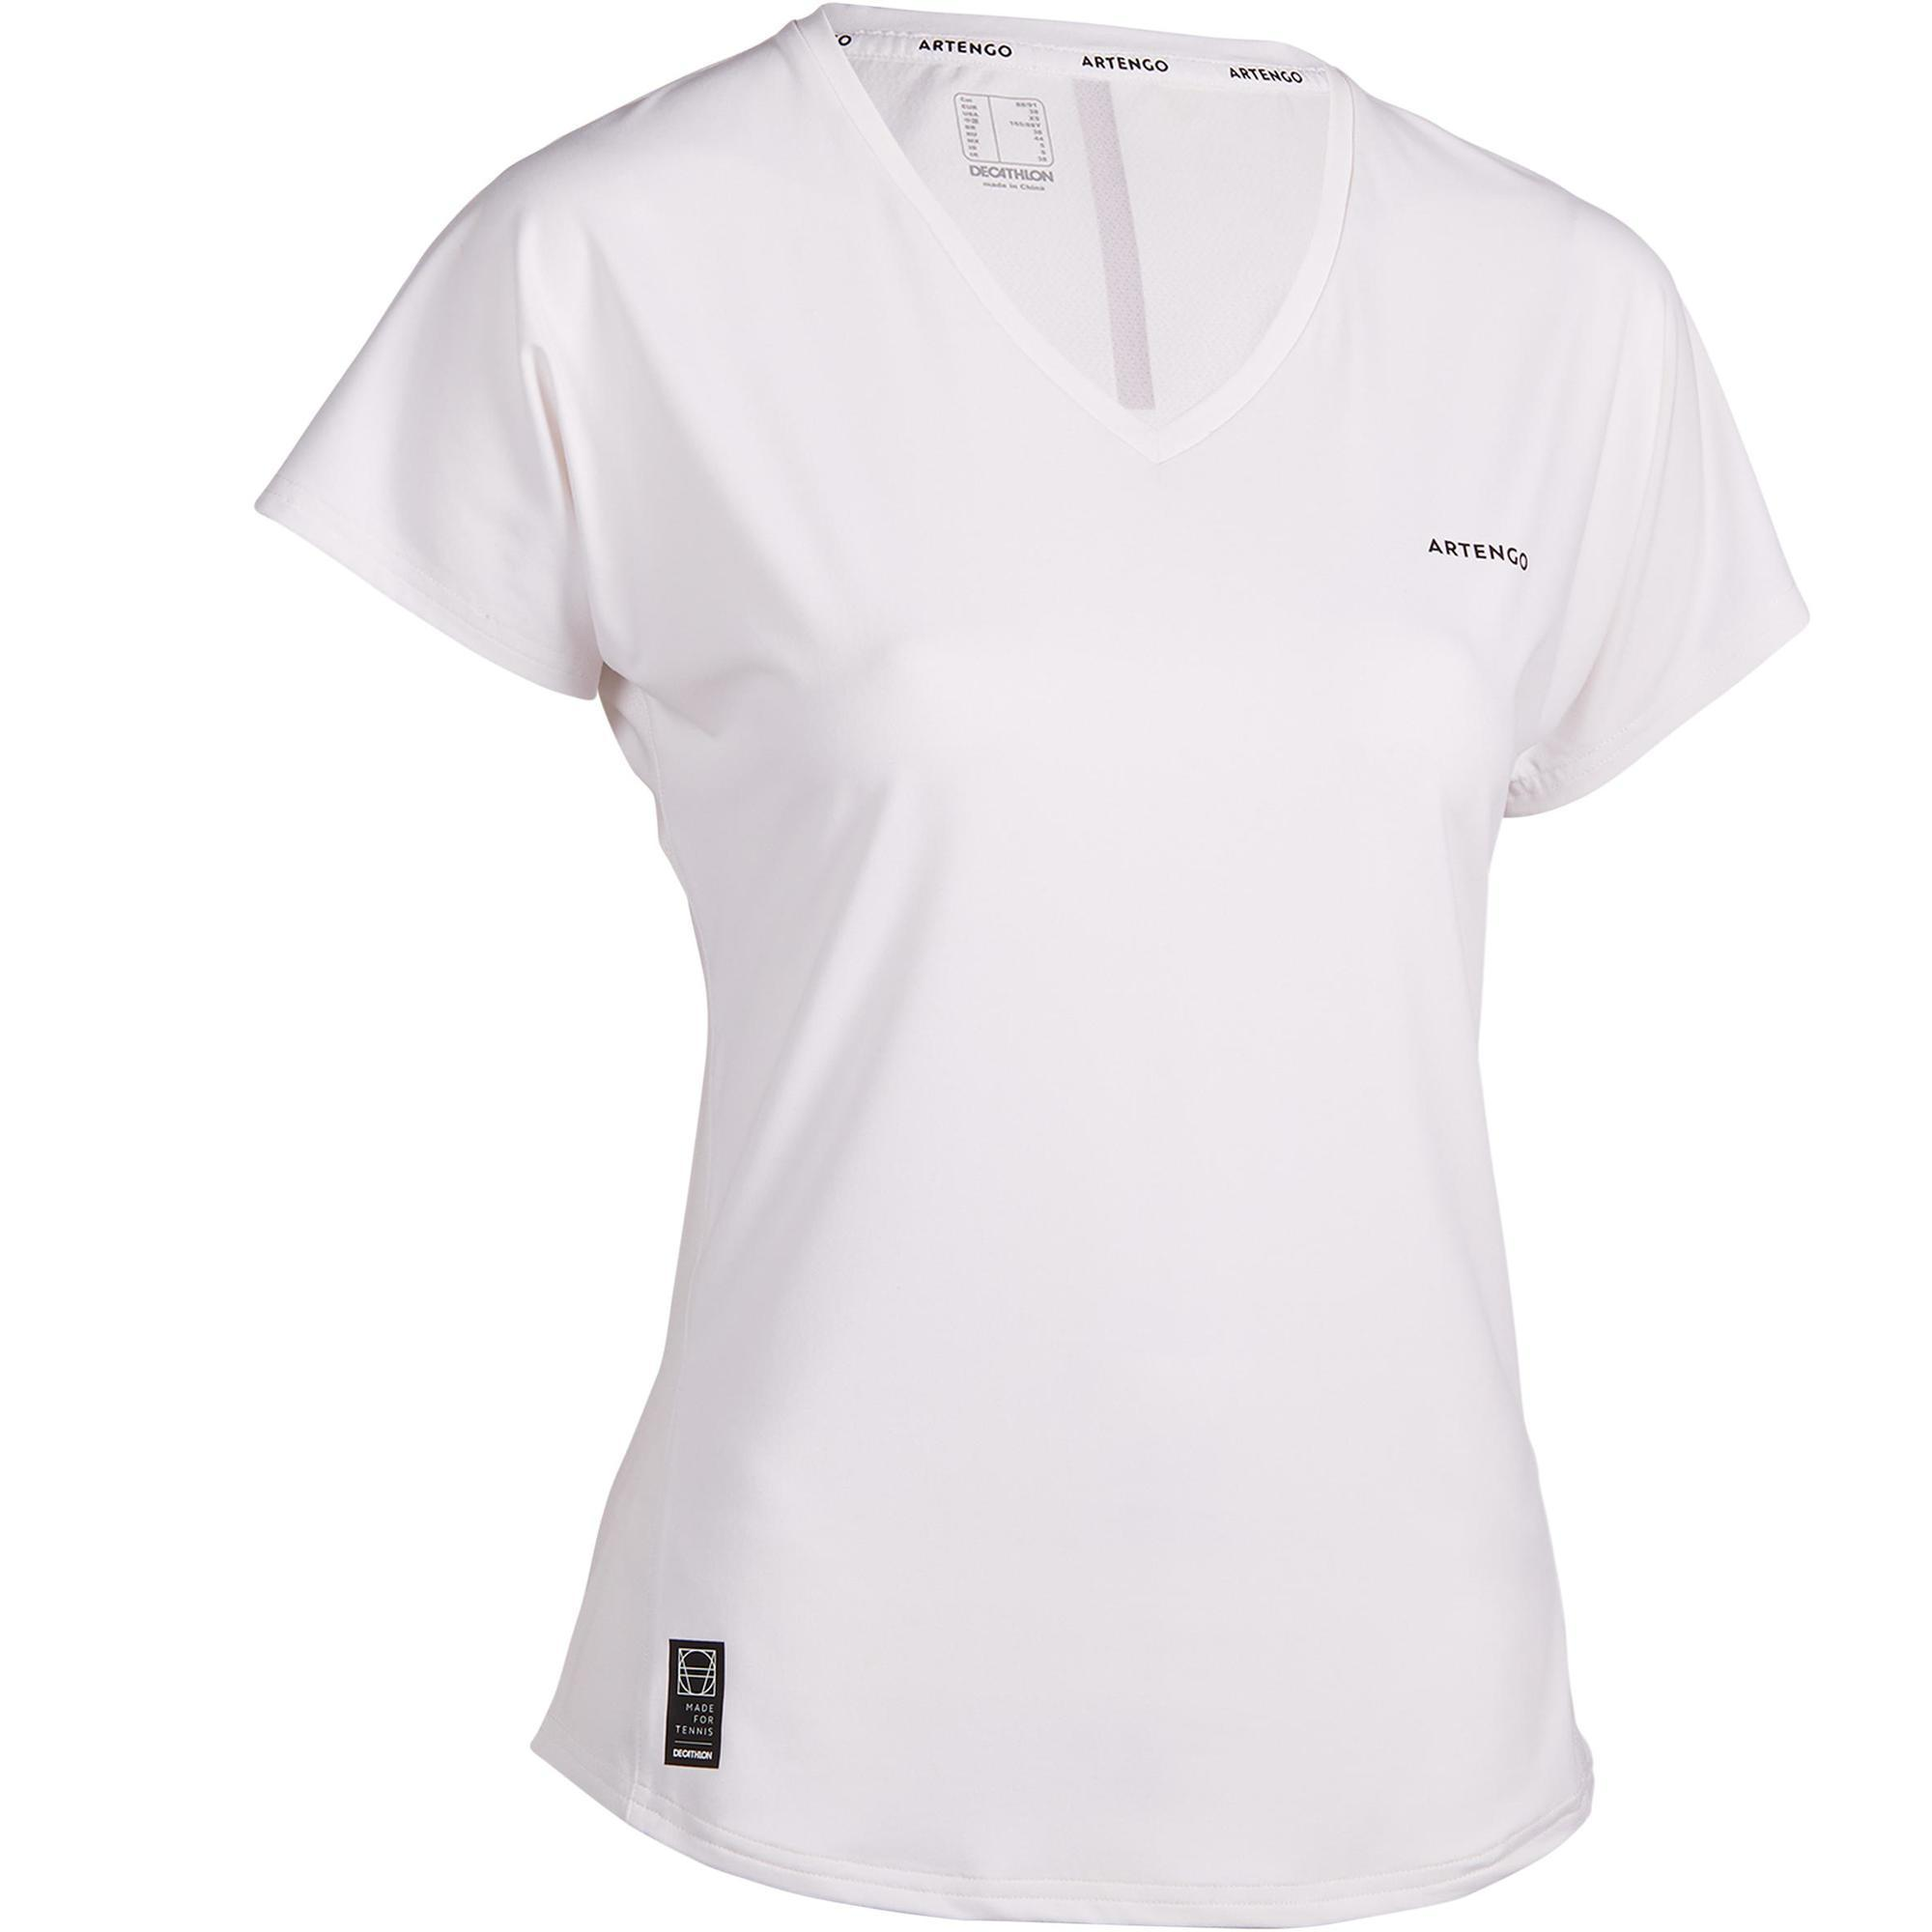 Artengo T-shirt voor tennis dames TS Soft 500 wit